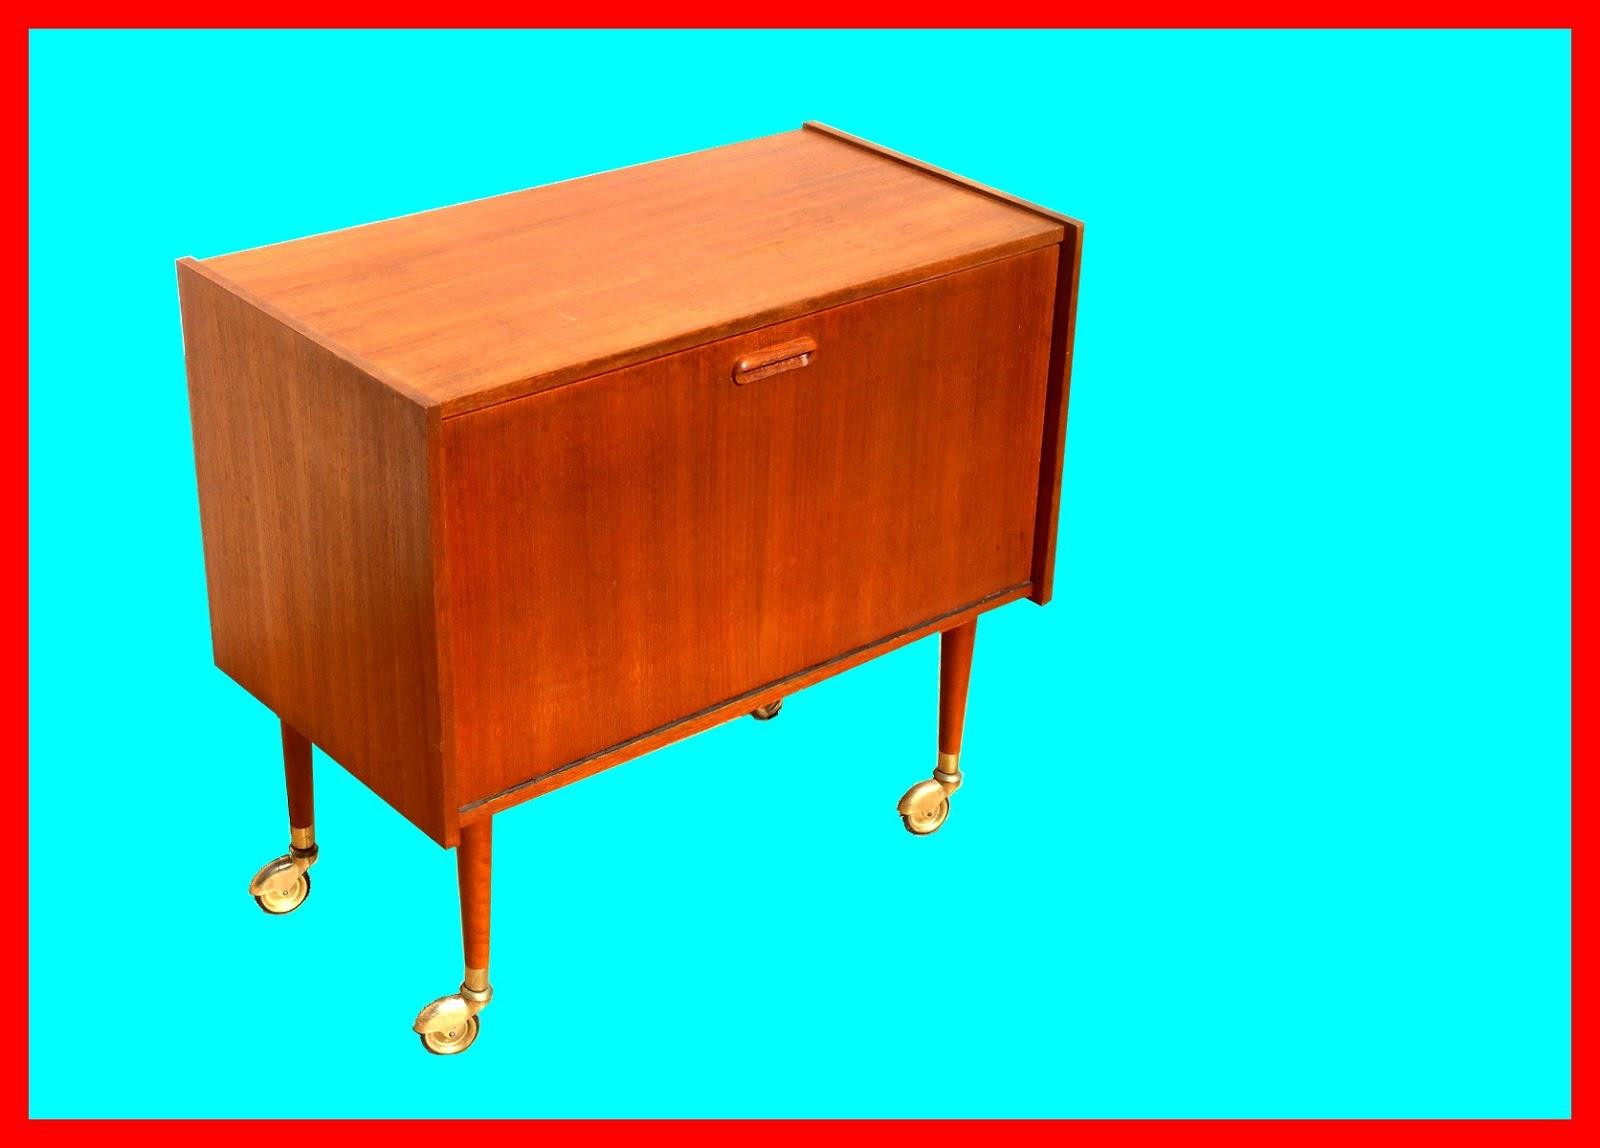 diy r nover un meuble bar des ann es 60 kitty crumpets. Black Bedroom Furniture Sets. Home Design Ideas